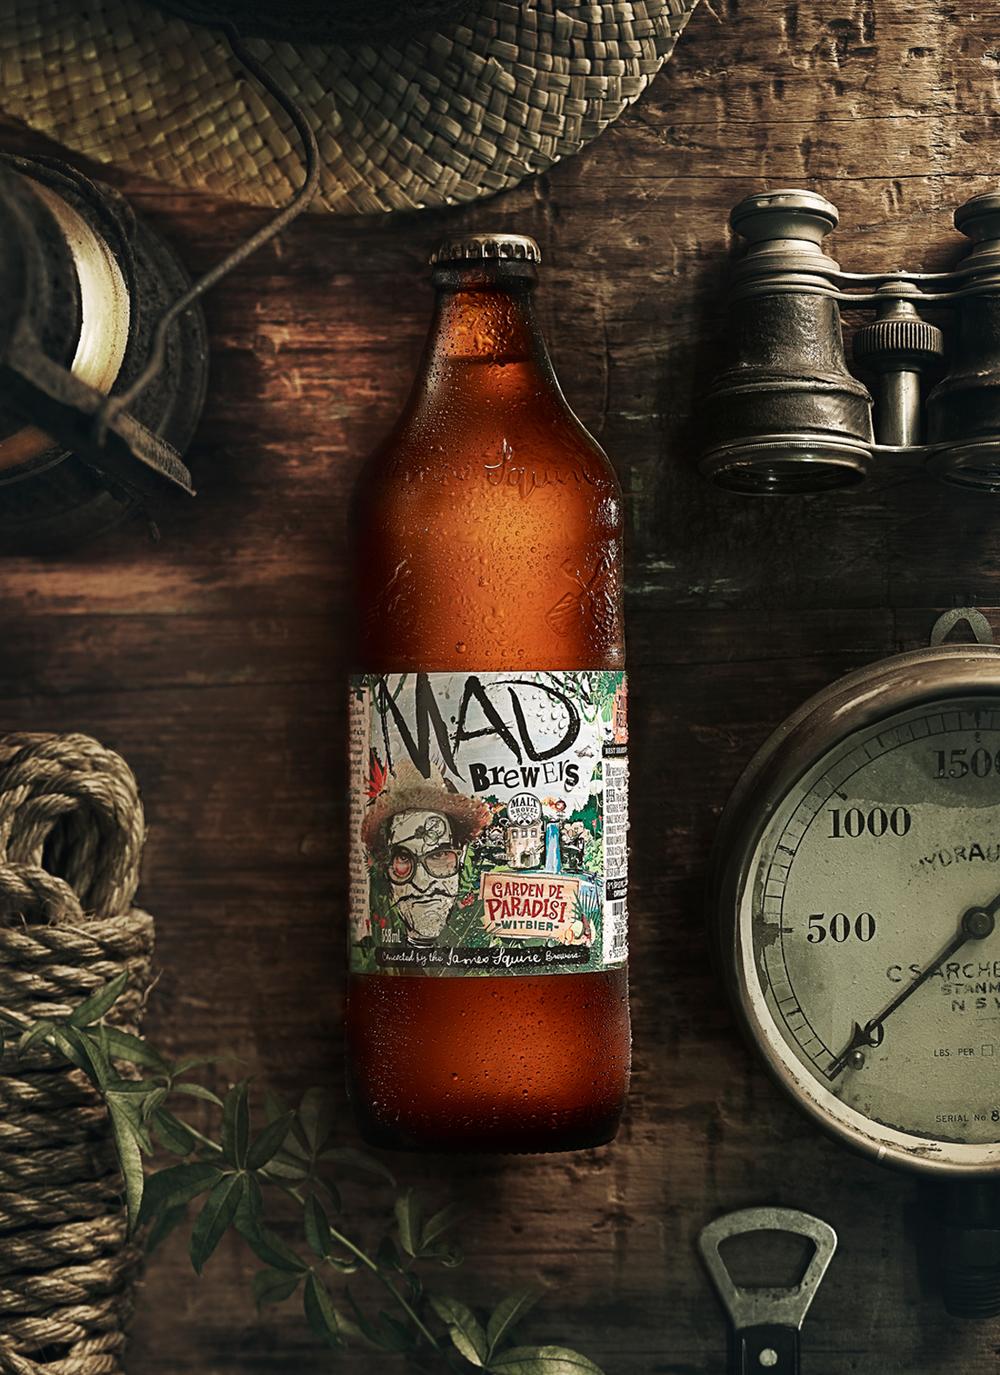 Mad_Brewers_Garden_De_Paradisi_Hero2_LR.jpg